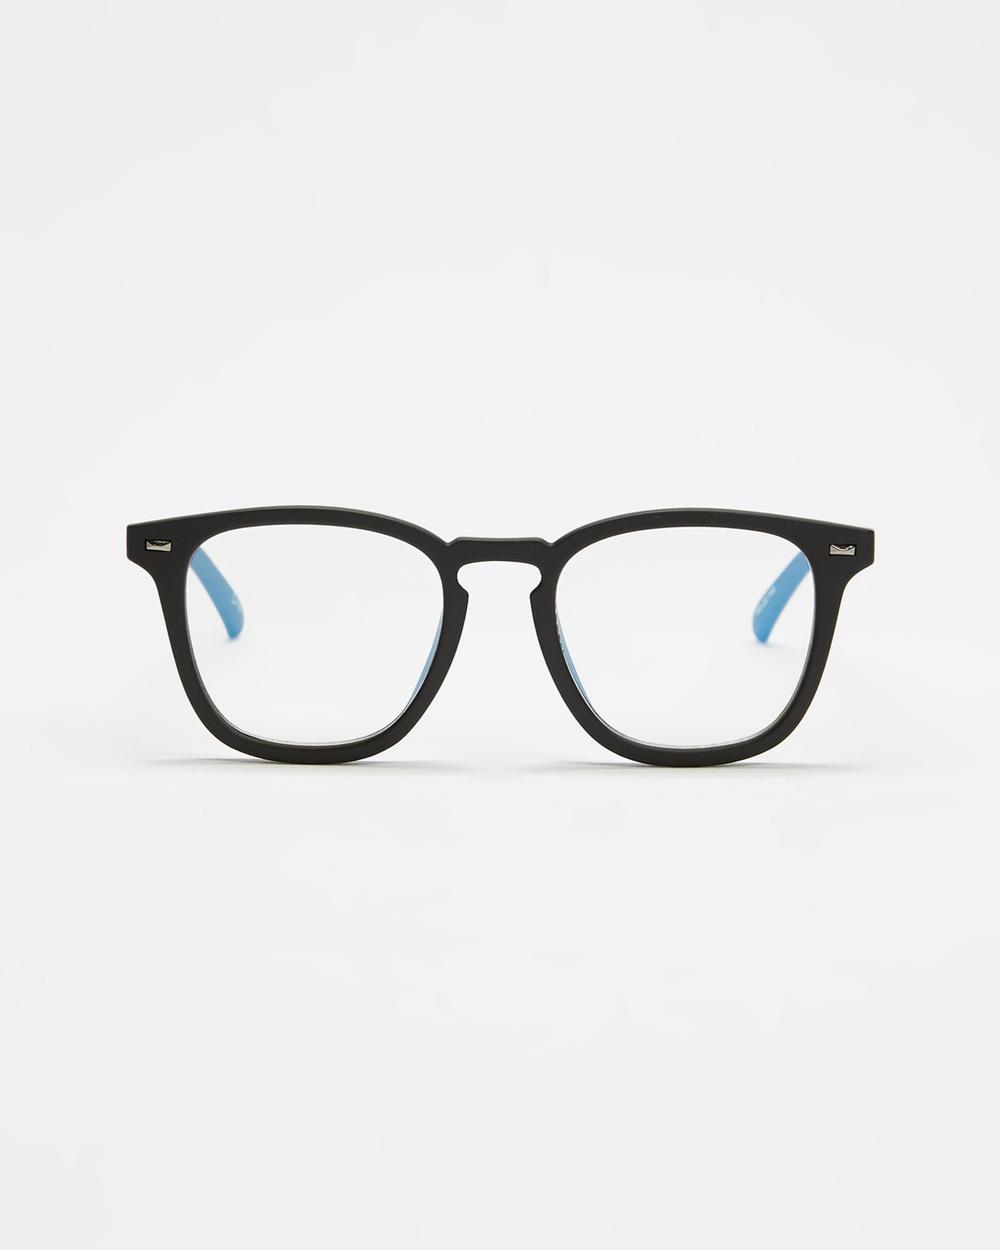 Le Specs No Biggie Blue Light Glasses Optical Black